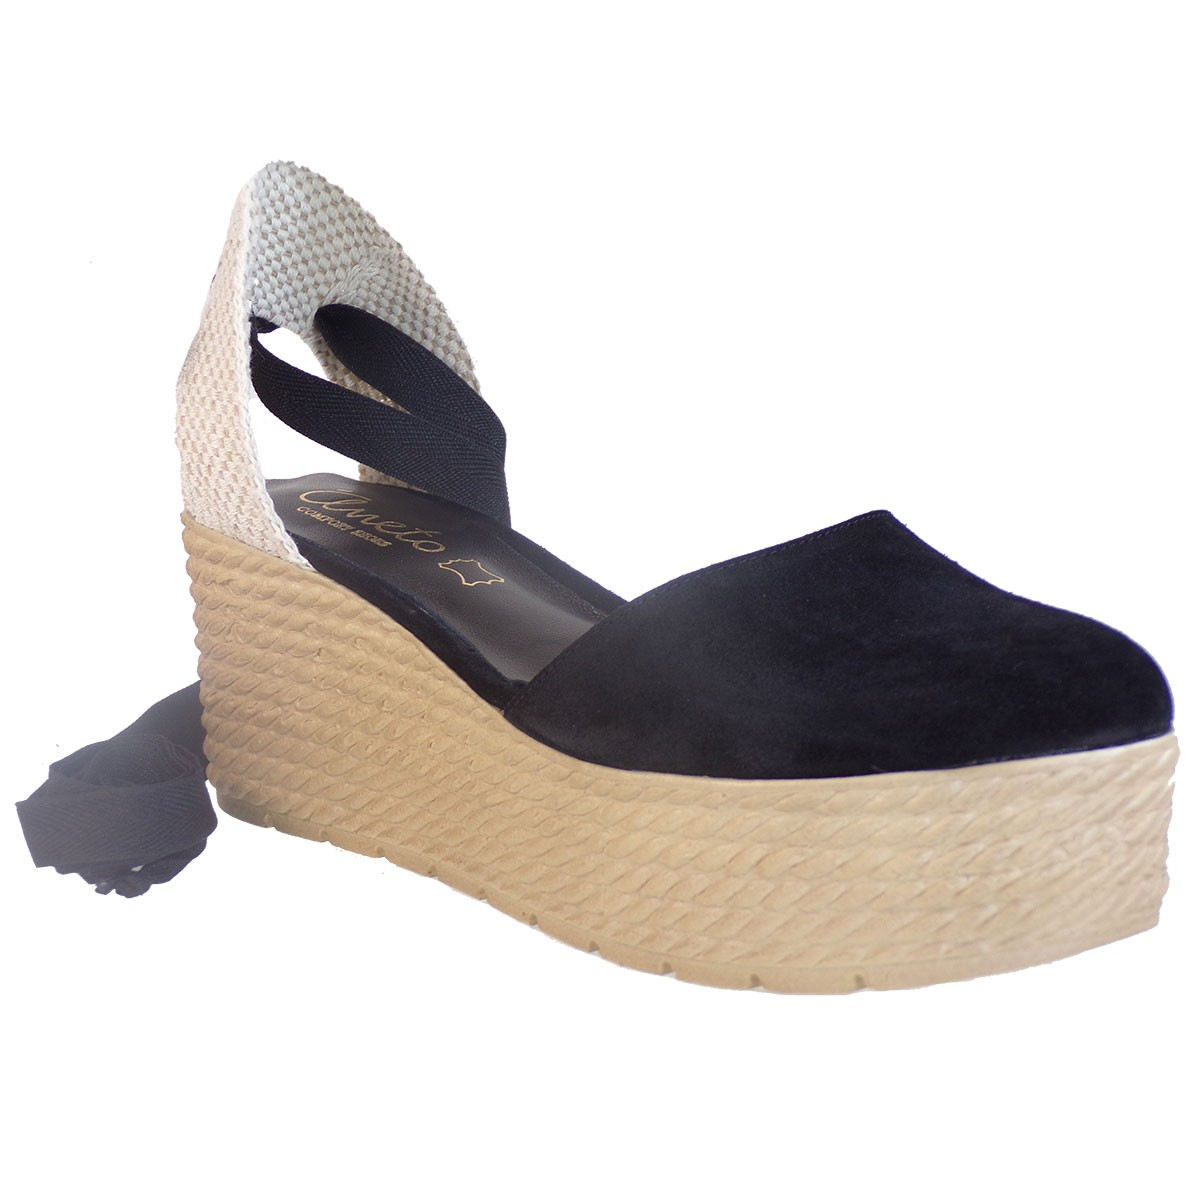 f88d1848e23 Katia Shoes Anneto Γυναικείες Εσπαντρίγιες Κ155-1087 Μαύρο